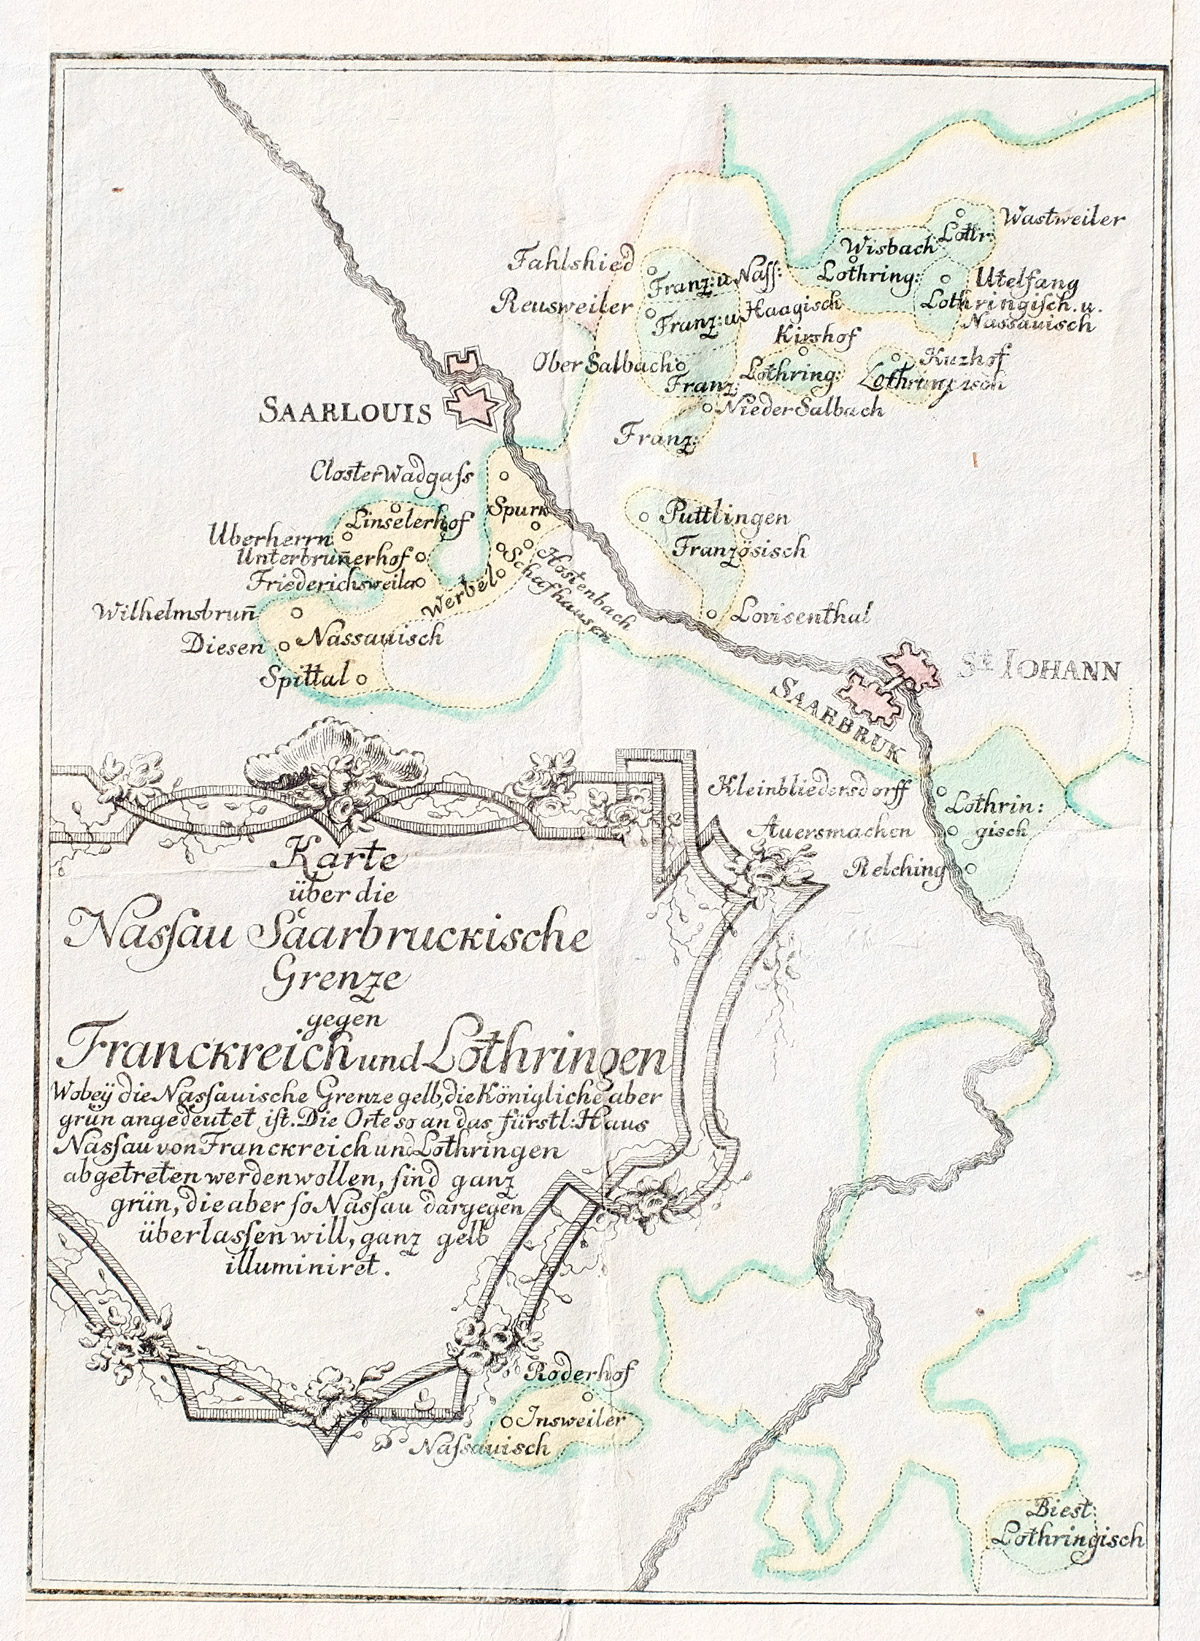 Lothringen Karte.Kupferstich Koloriert Karte Uber Die Nassau Saarbruckische